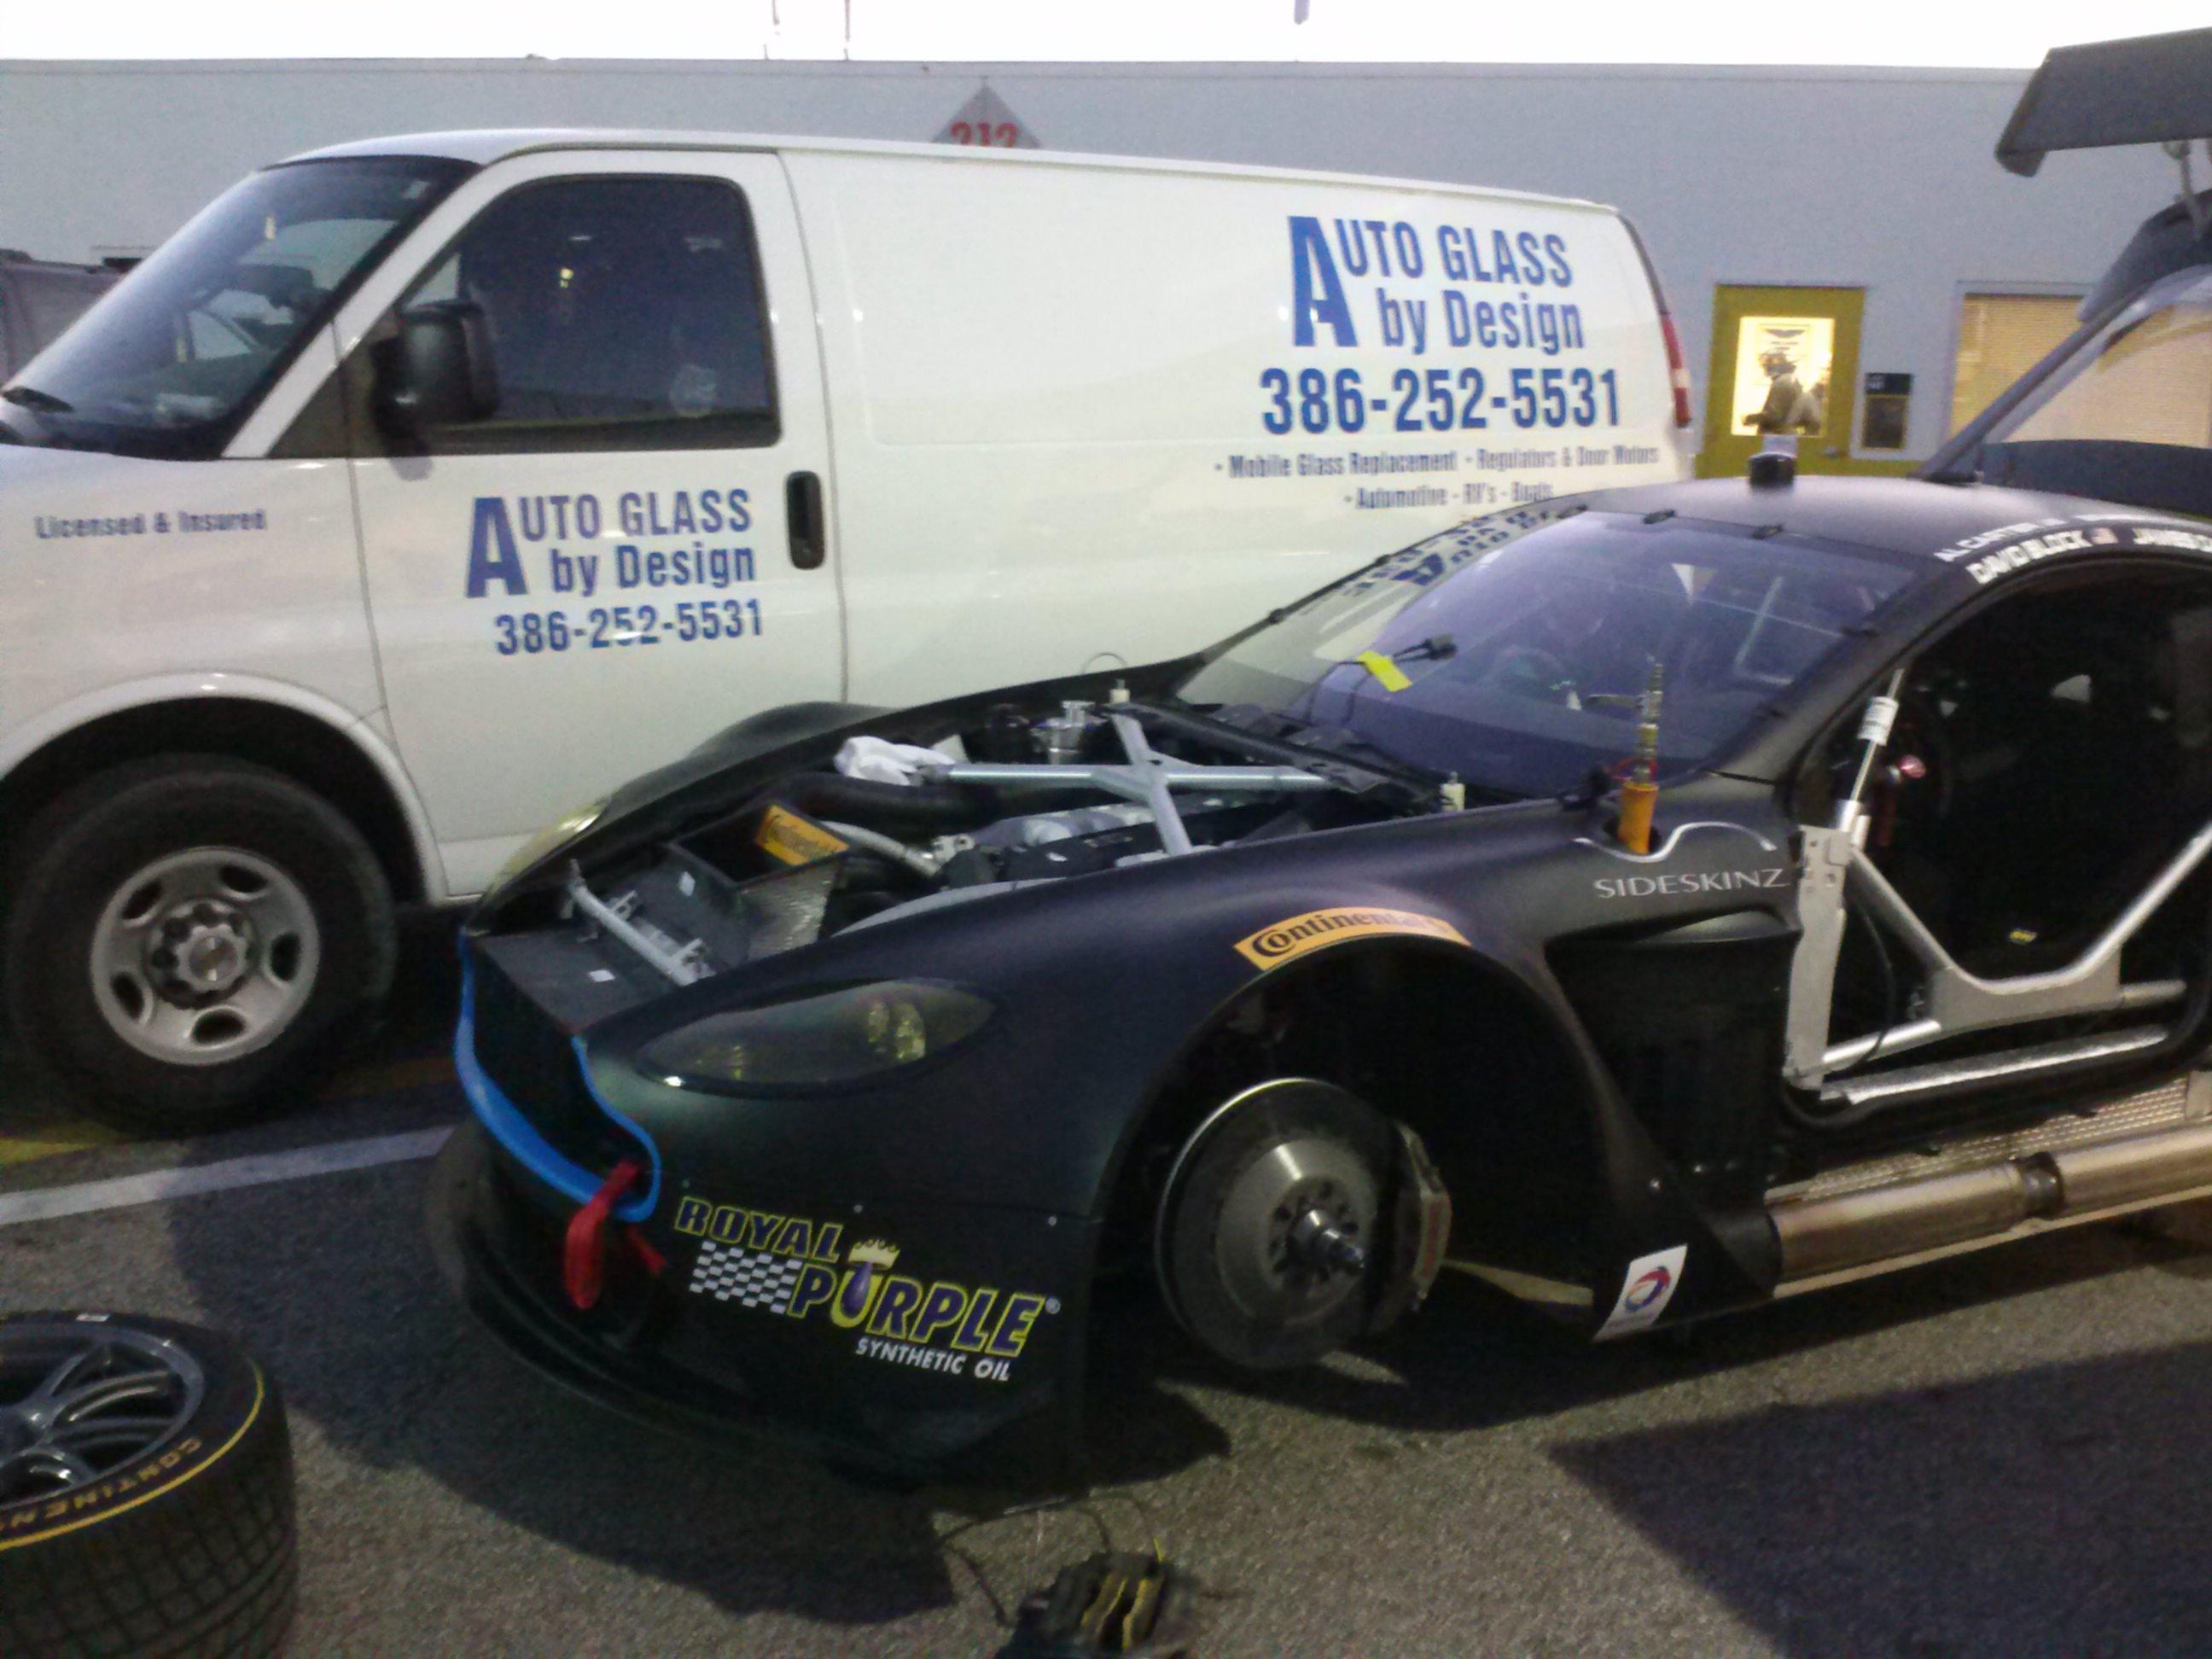 Auto Glass Repair in Palm Coast, Florida